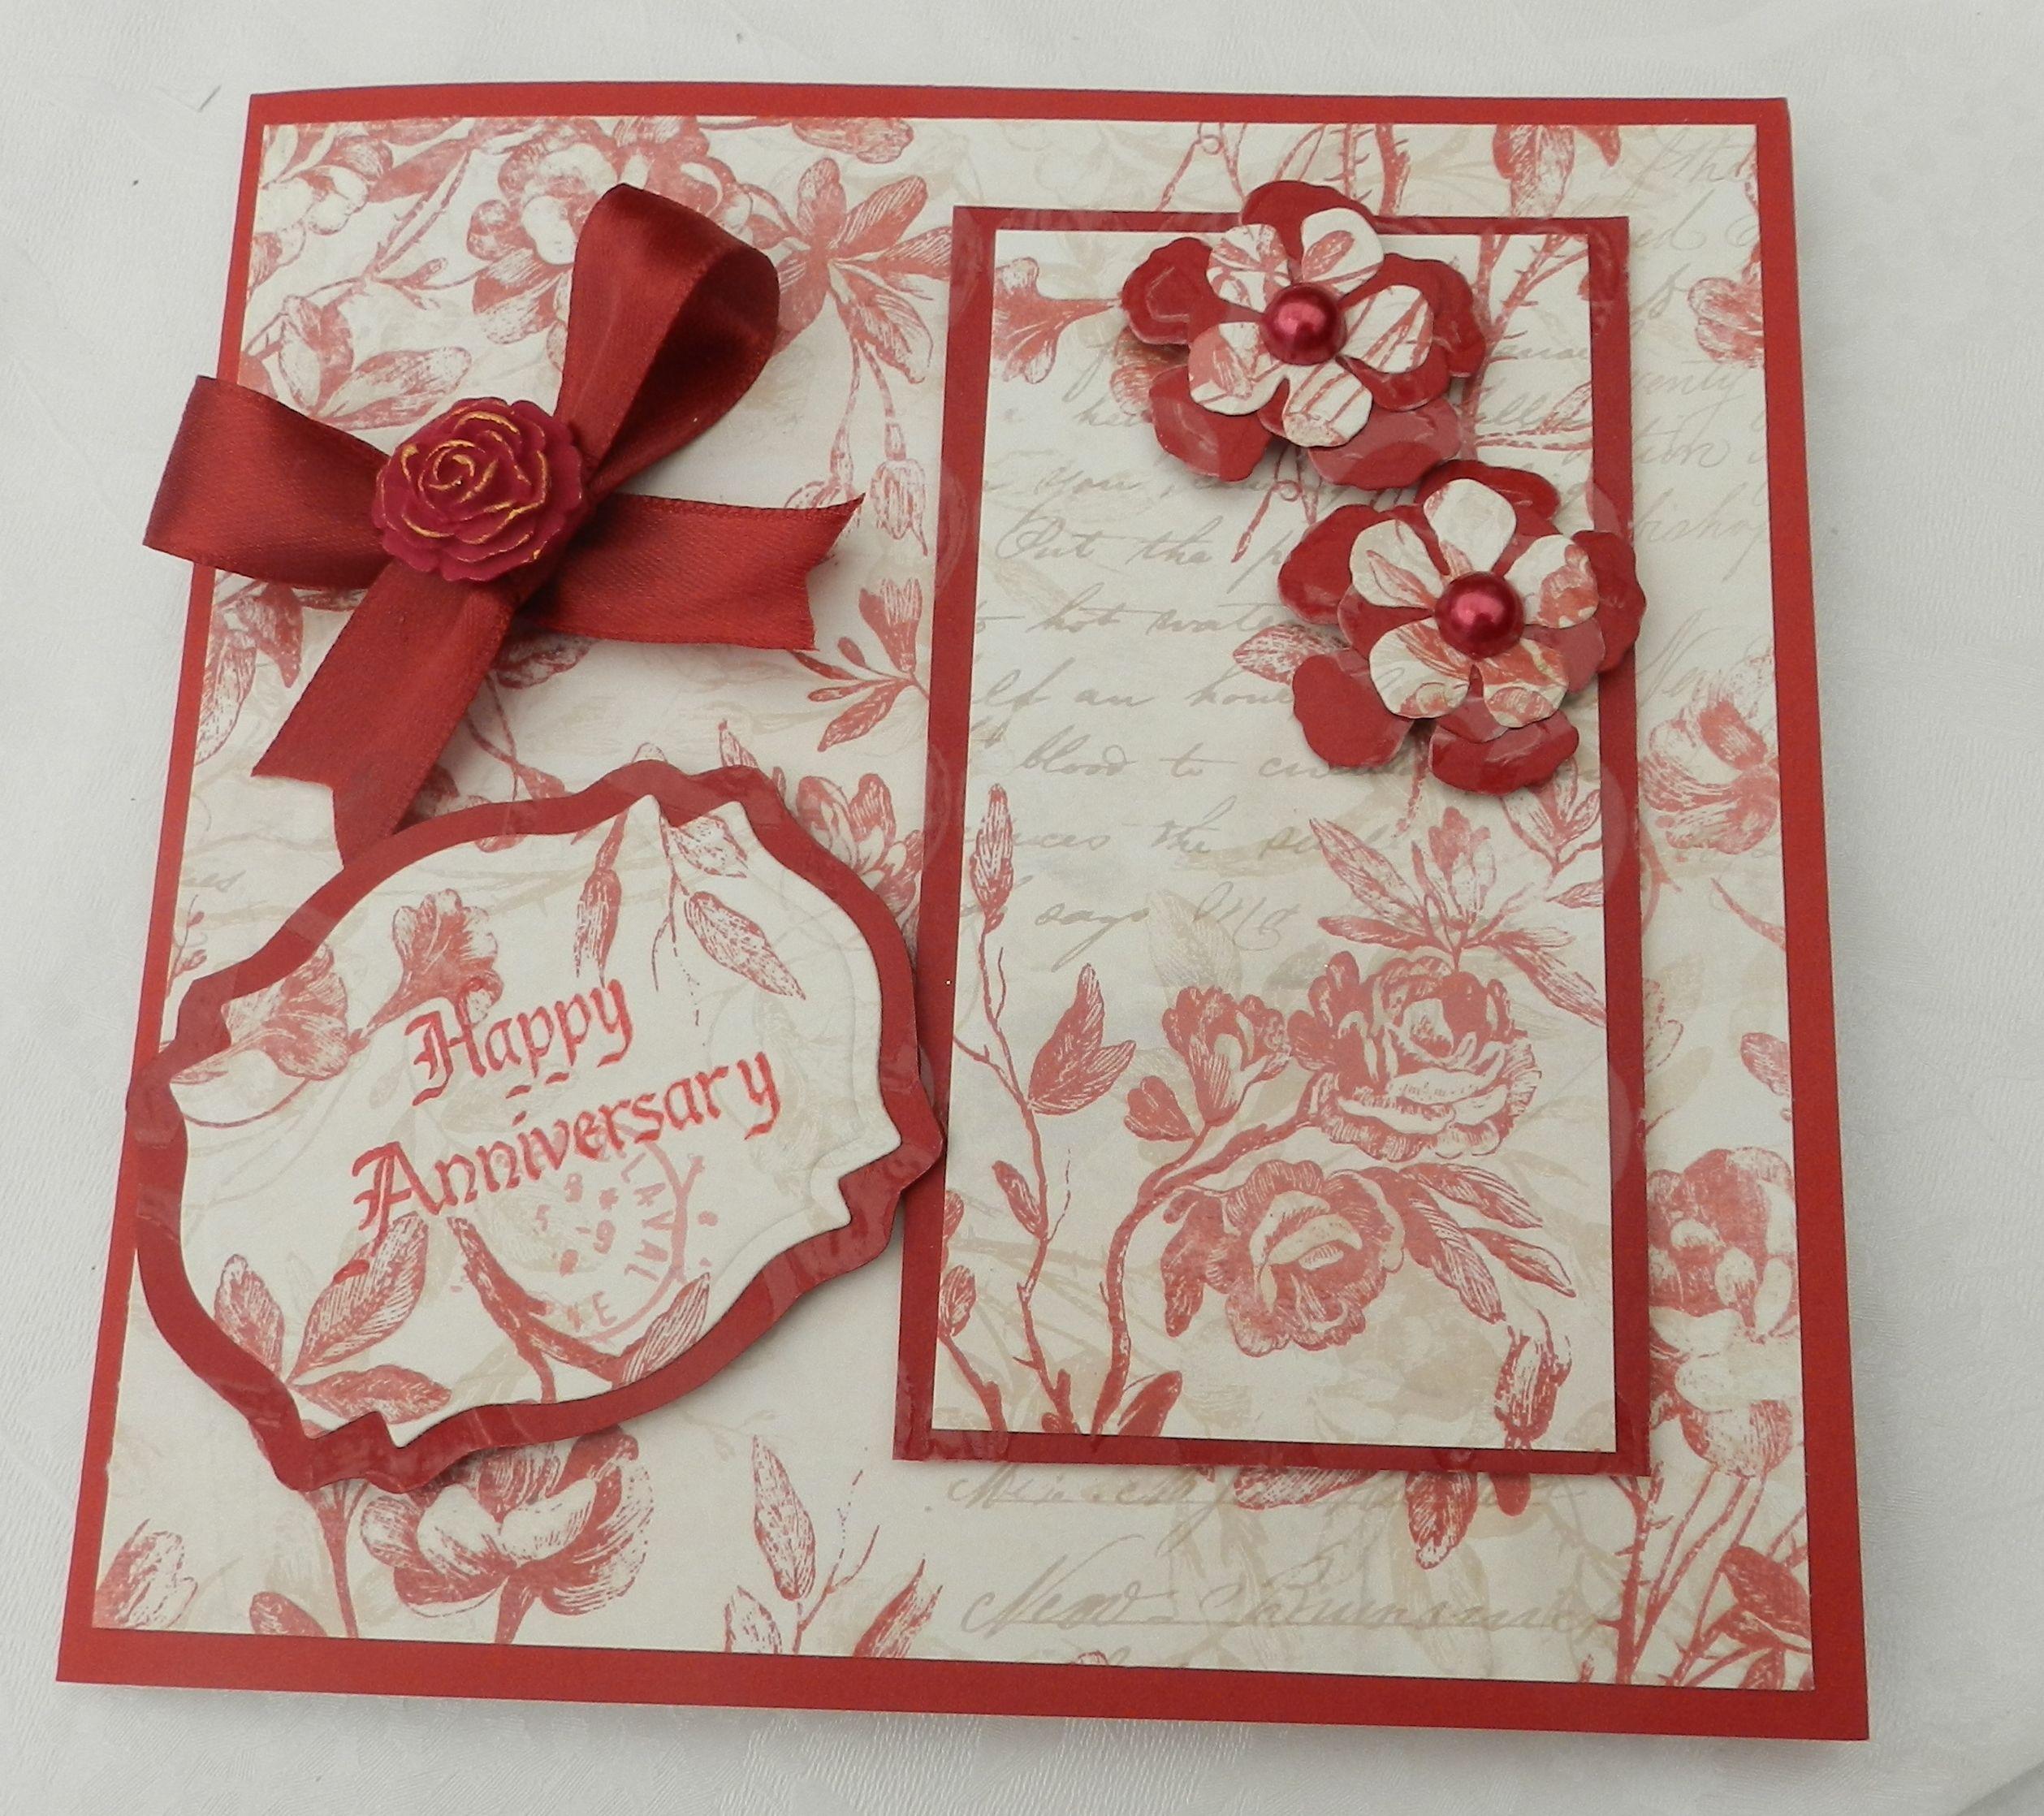 Ruby wedding anniversary card | d4d6 | Pinterest | Ruby wedding ...